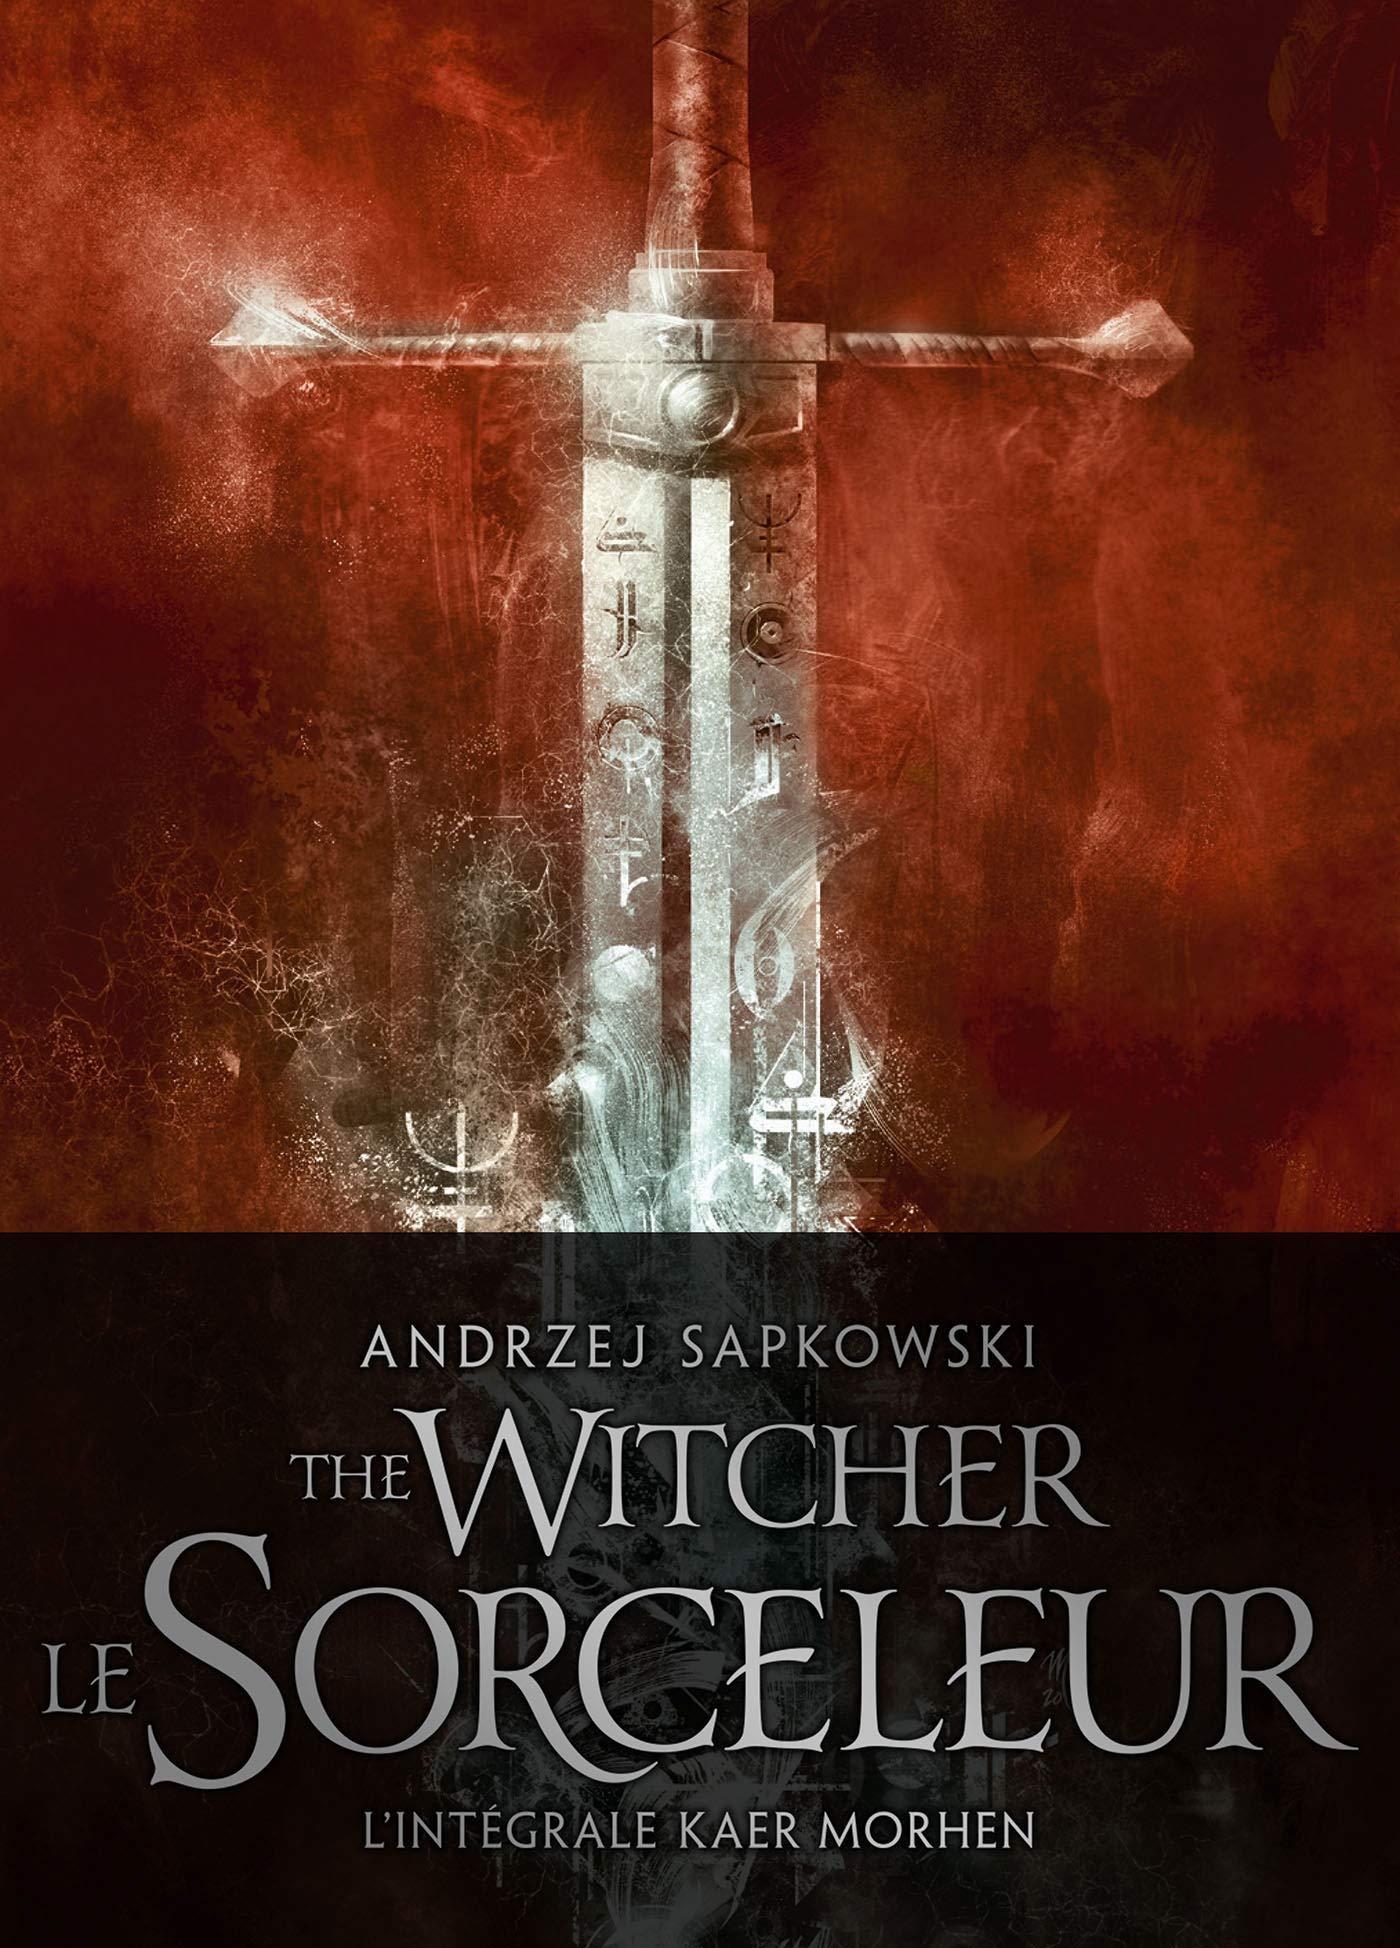 The Witcher – Le Sorceleur : L'Intégrale Kaer Morhen – Collector / The Witcher